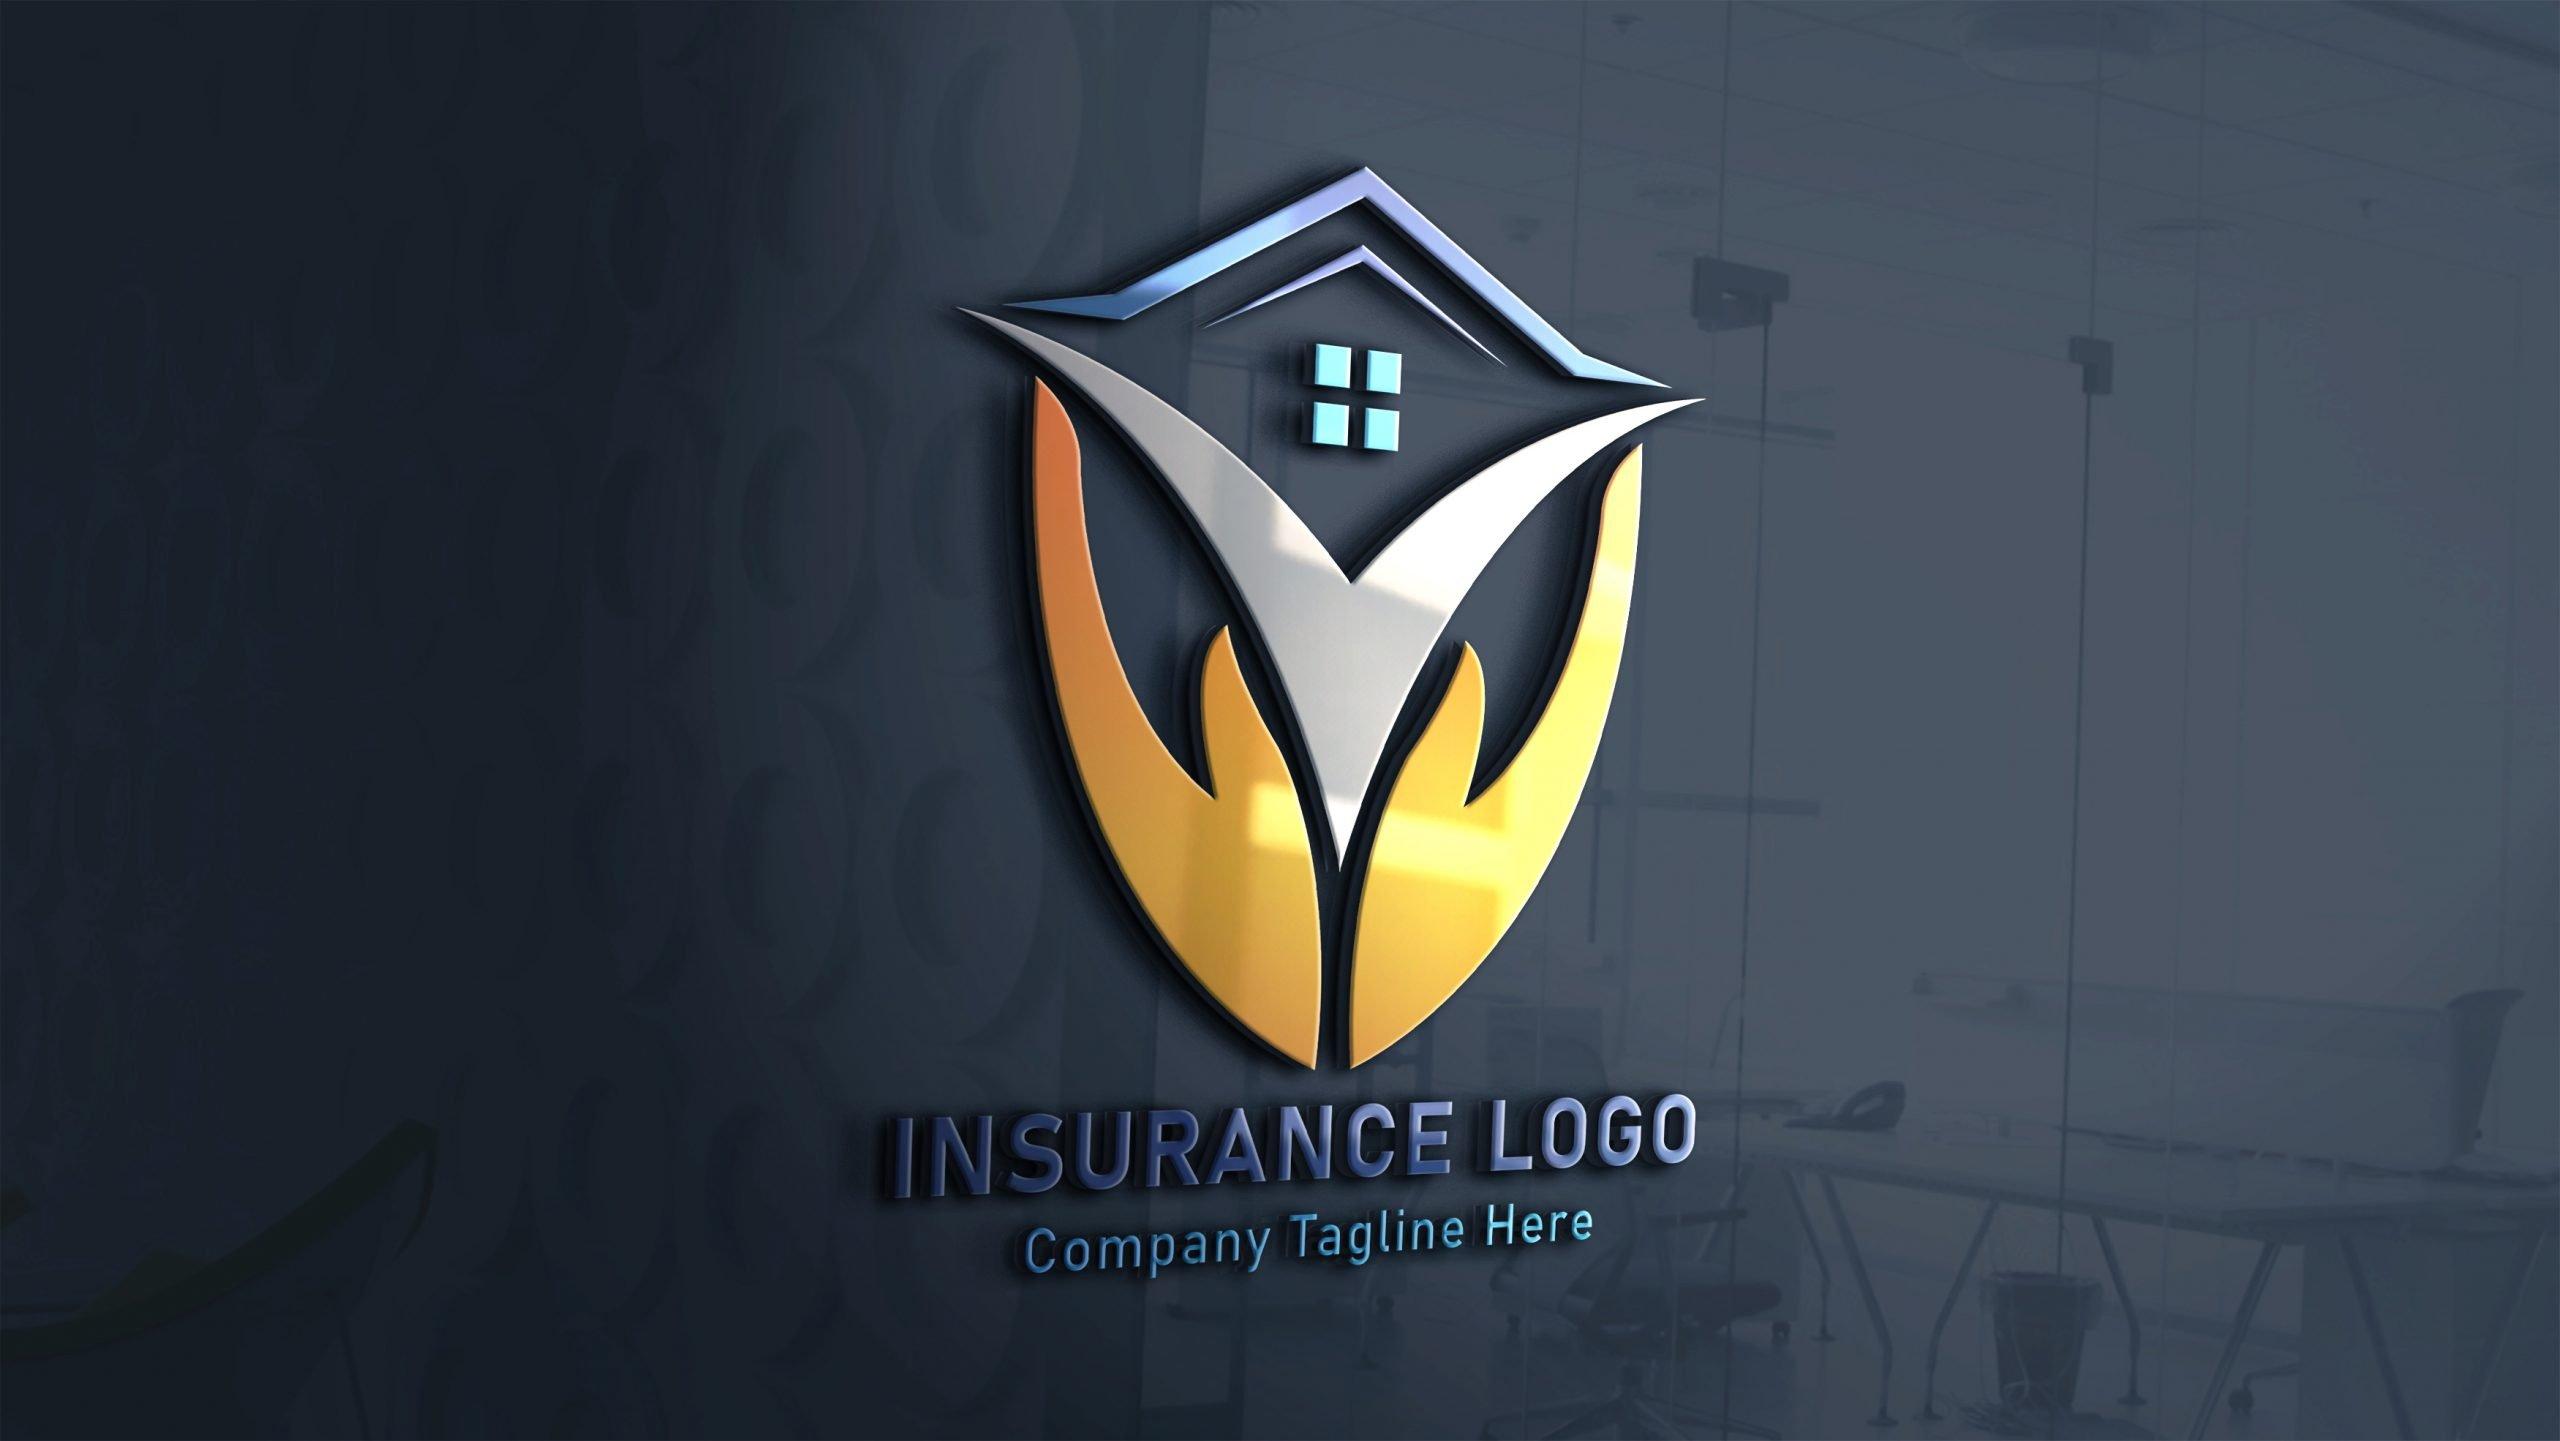 Finance & Insurance Logo Design on 3d glass window